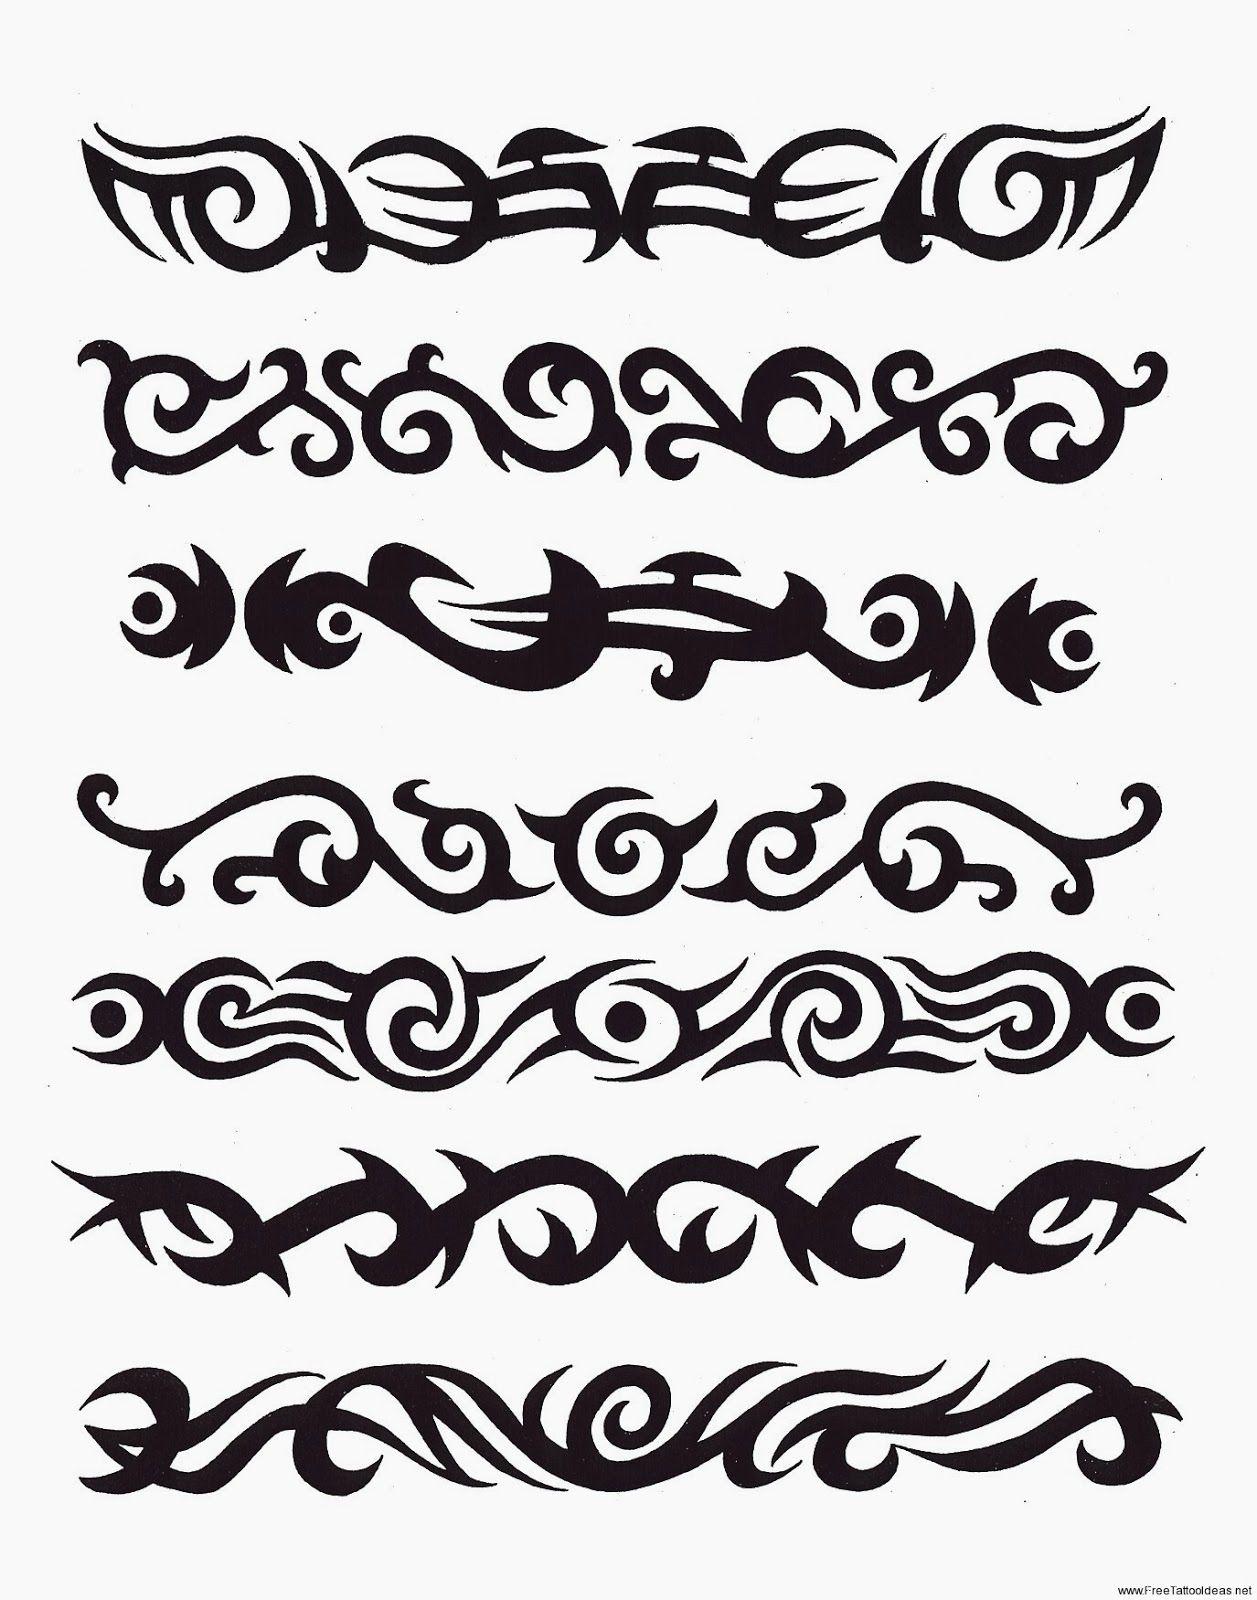 Tribal Tattoos Armband For Men Tribal Armband Tattoo Armband Tattoo Design Arm Band Tattoo